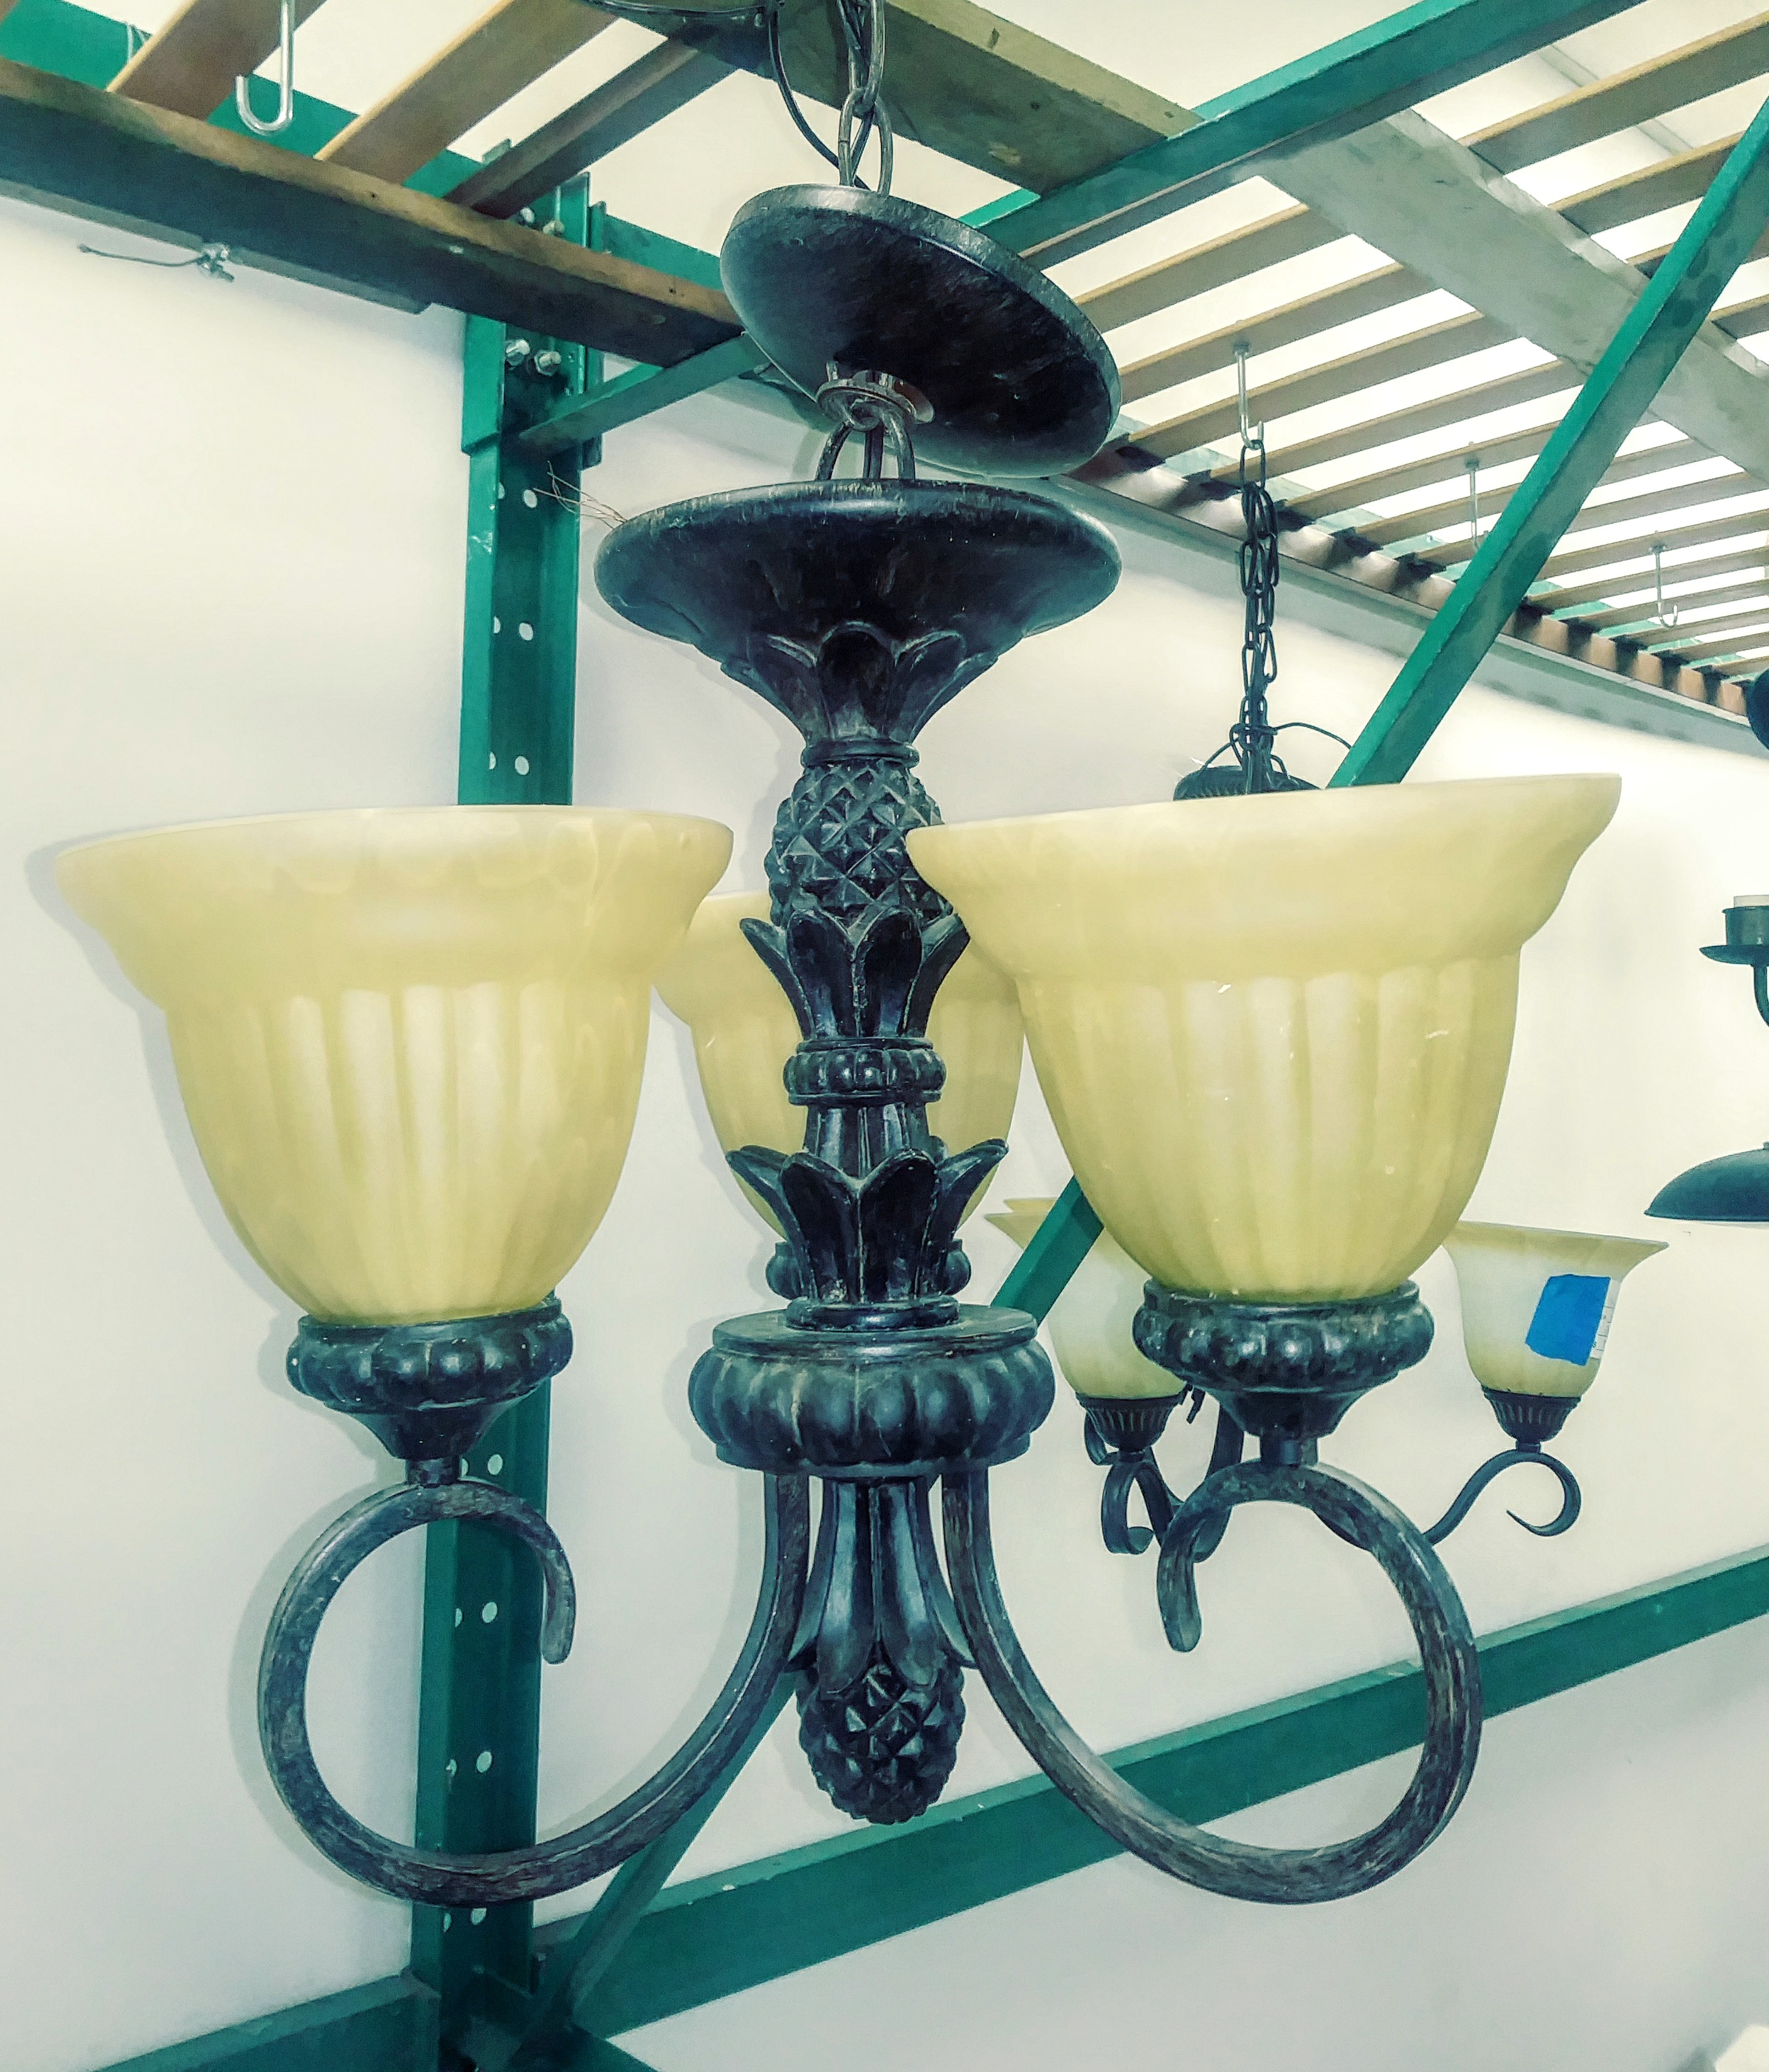 3-Light Chandelier w/ Pineapple Decor